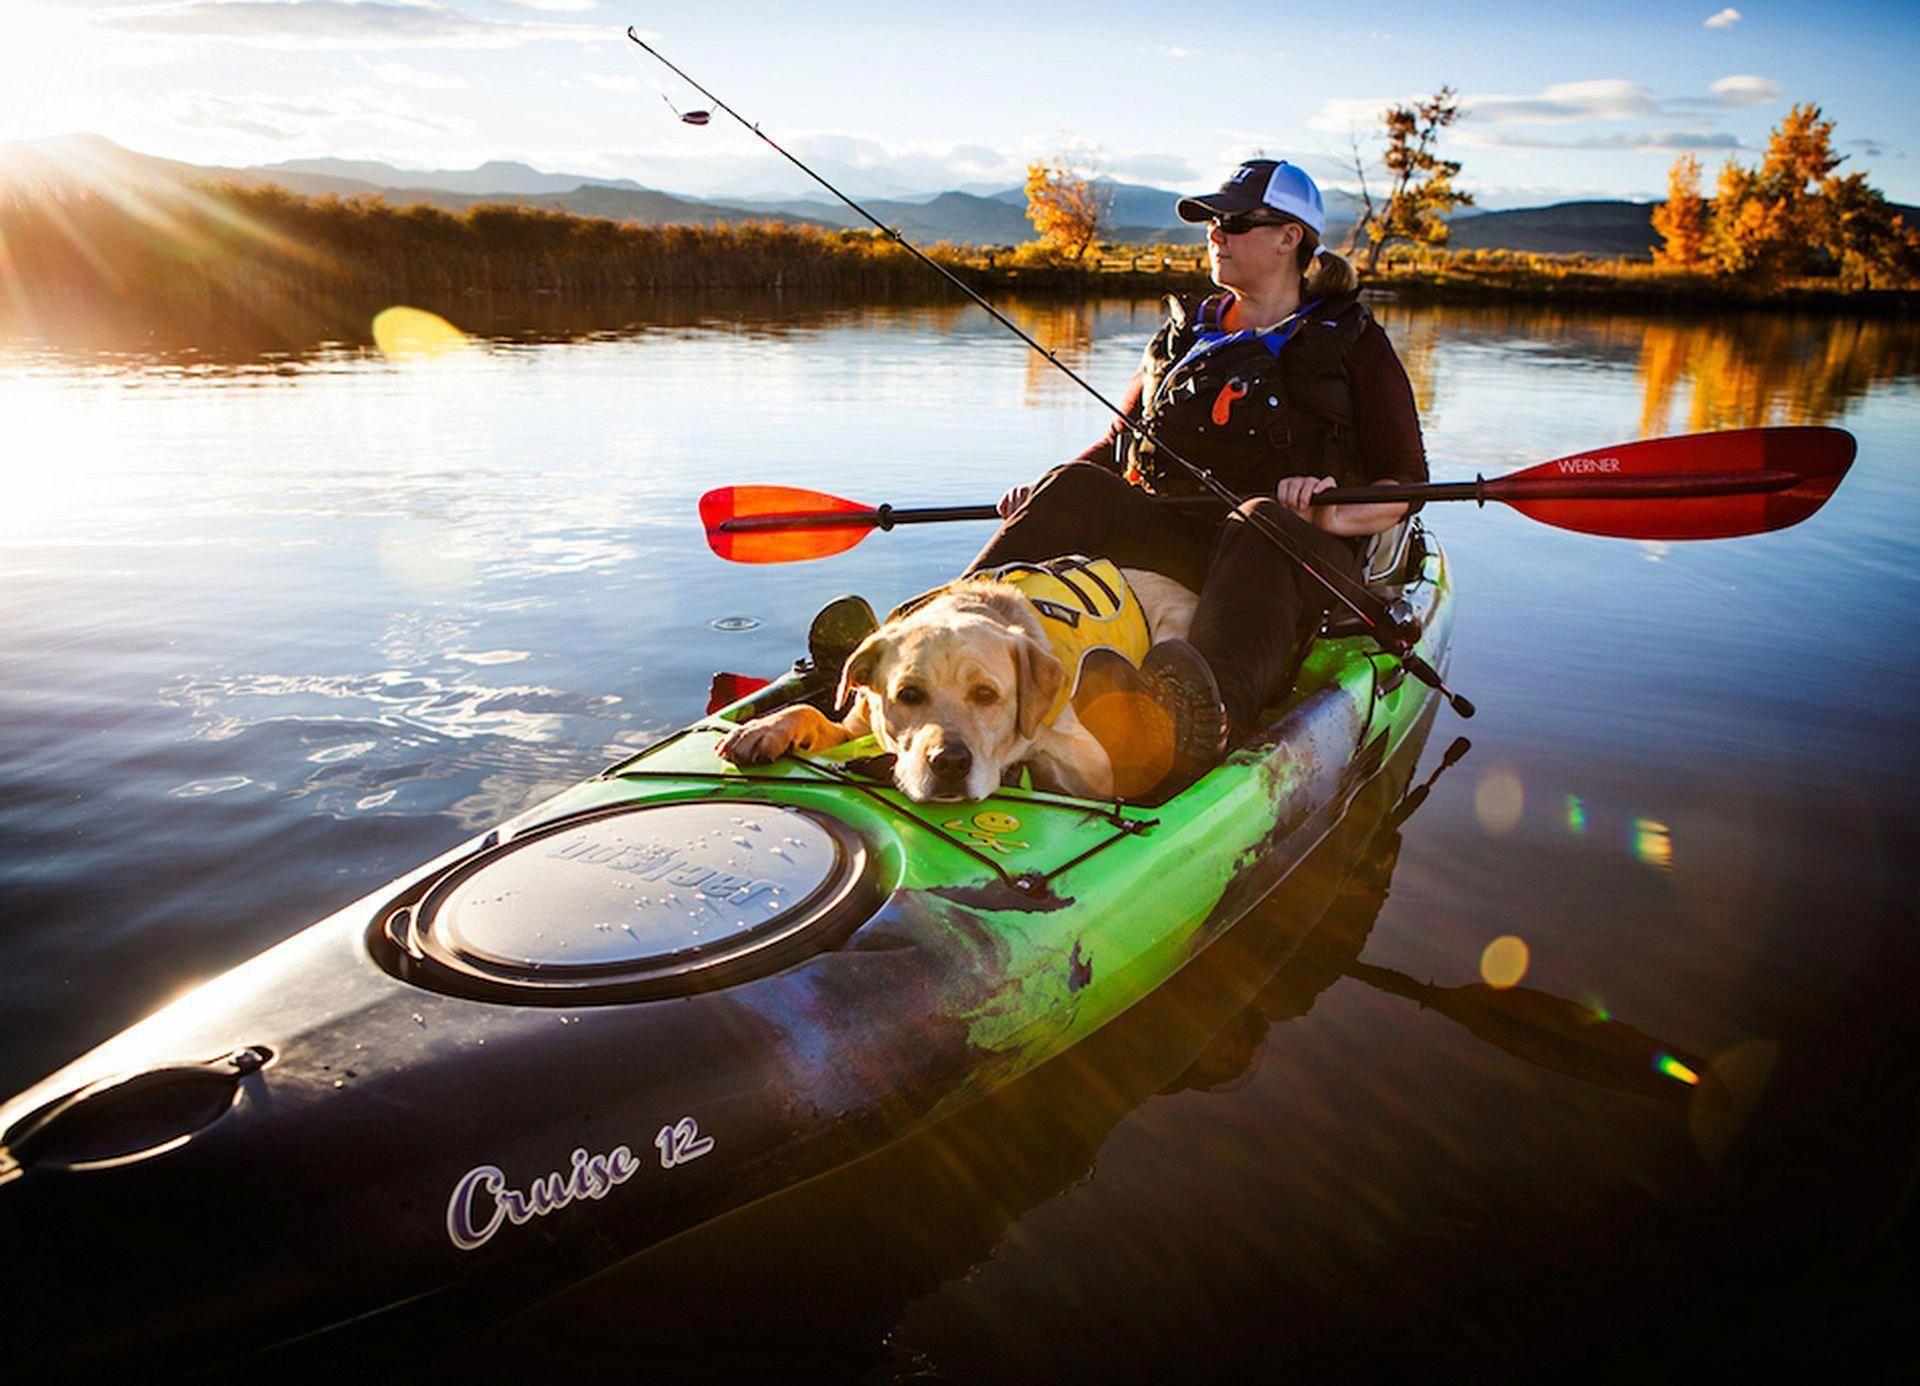 Dog Paddling 6 Tips To Take Your Pooch Canoeing Kayaking Or